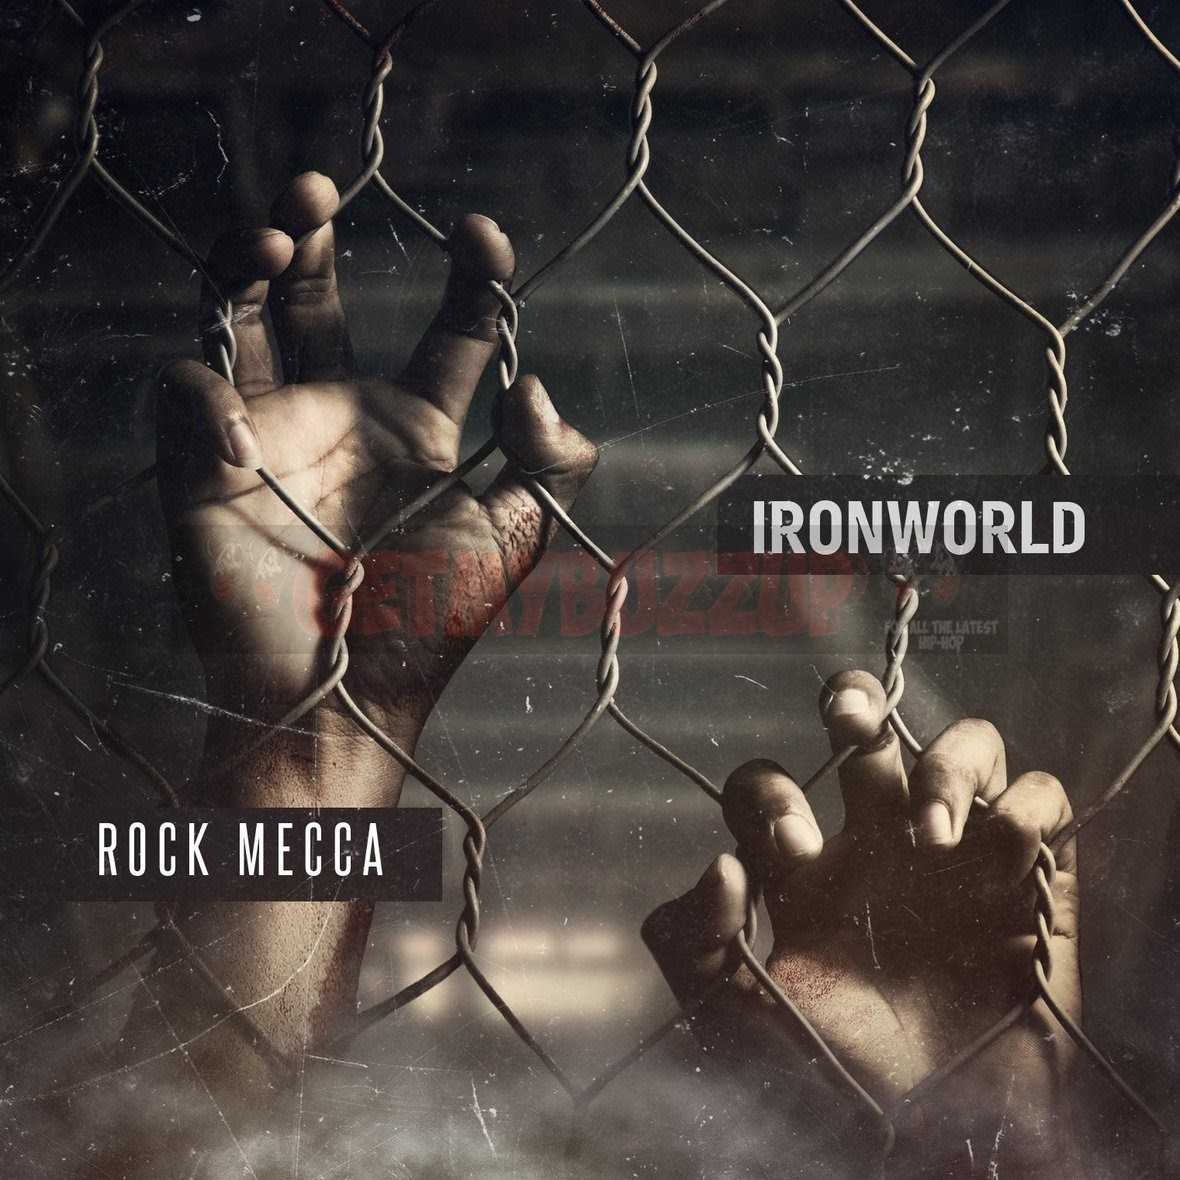 Album Stream: Rock Mecca – Ironworld (ft Canibus, Roc Marcian Tragedy Khadafi, Kool Keith) [Audio]